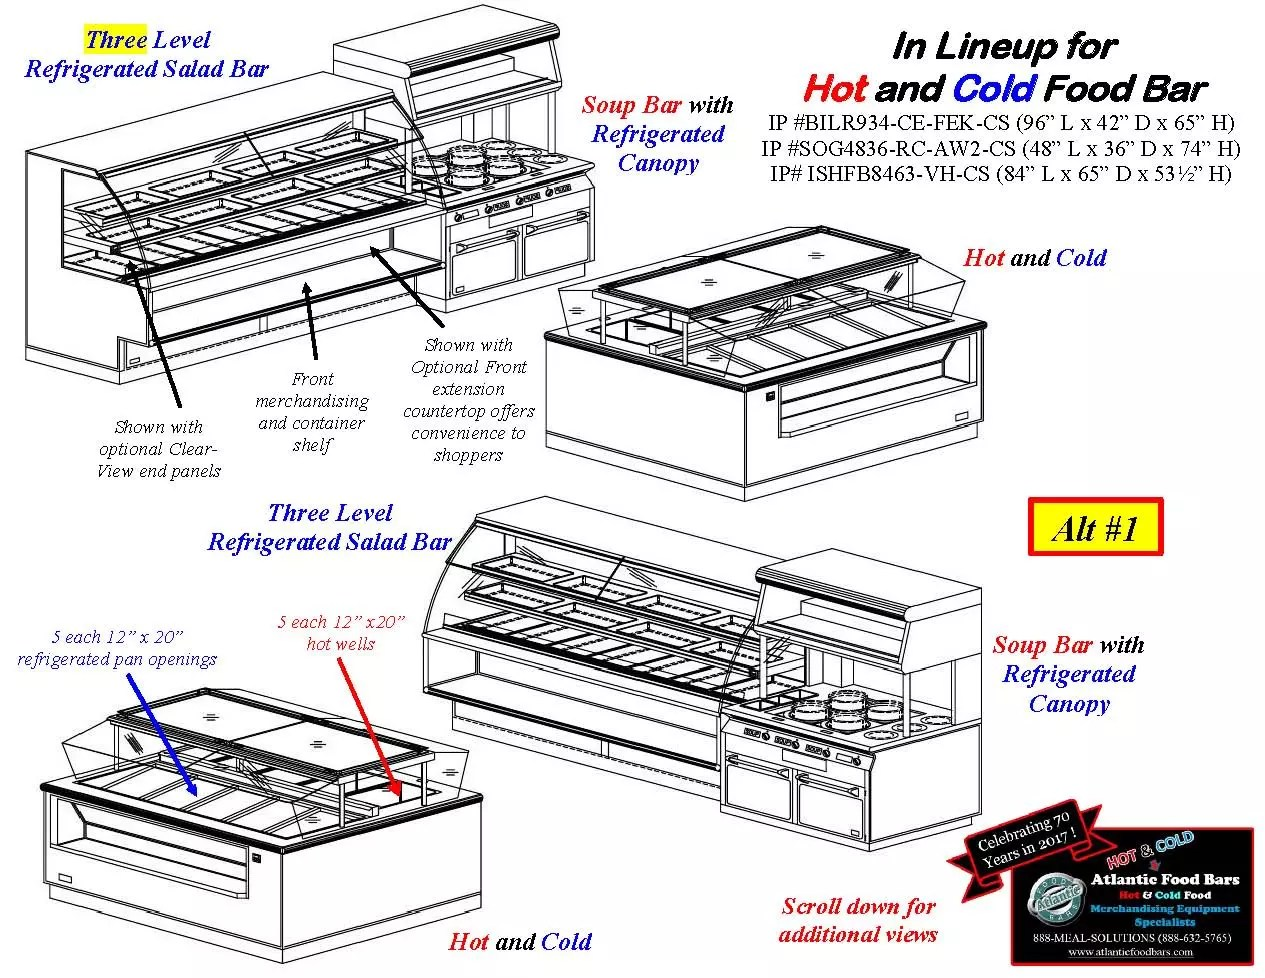 Atlantic Food Bars - Hot and Cold Display Case Lineup Drawings - BILR SOG ISHFB_Page_1